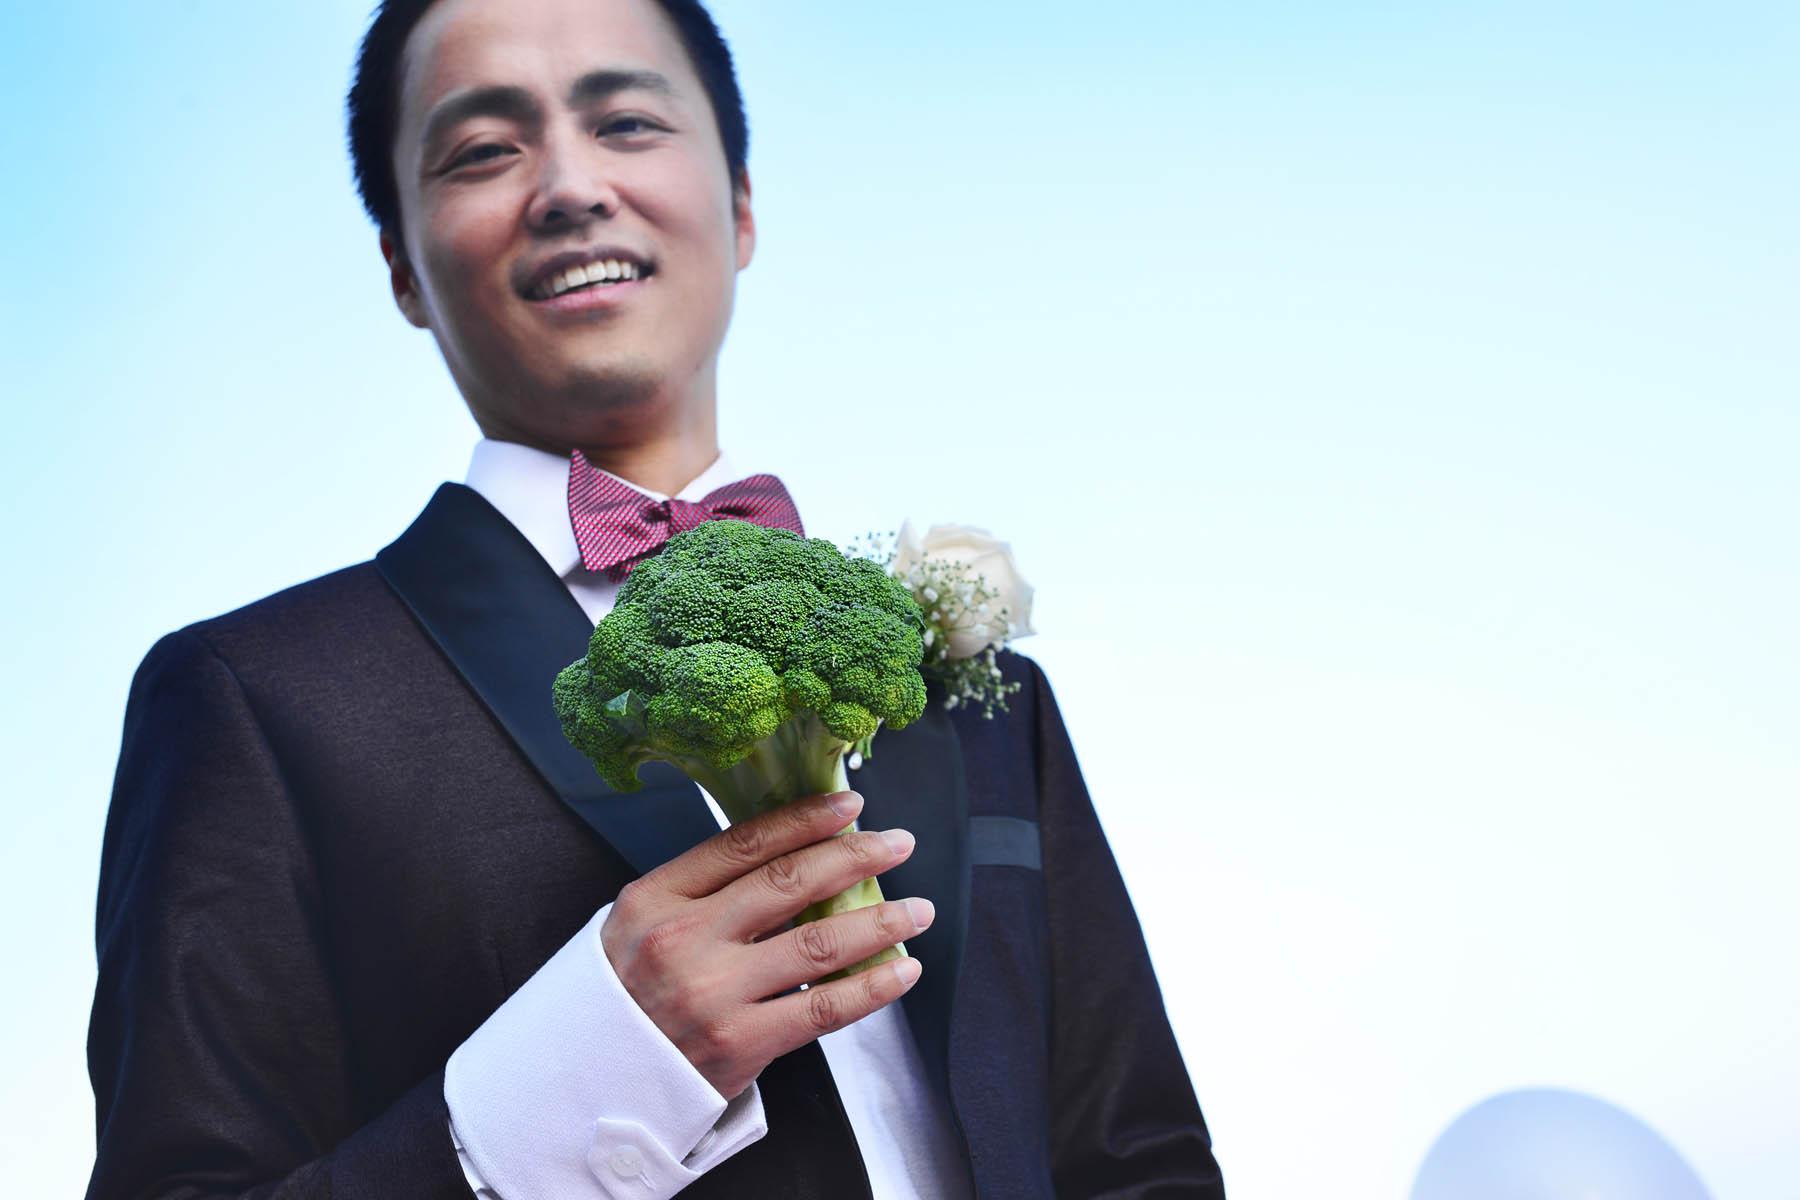 boda con broccoli